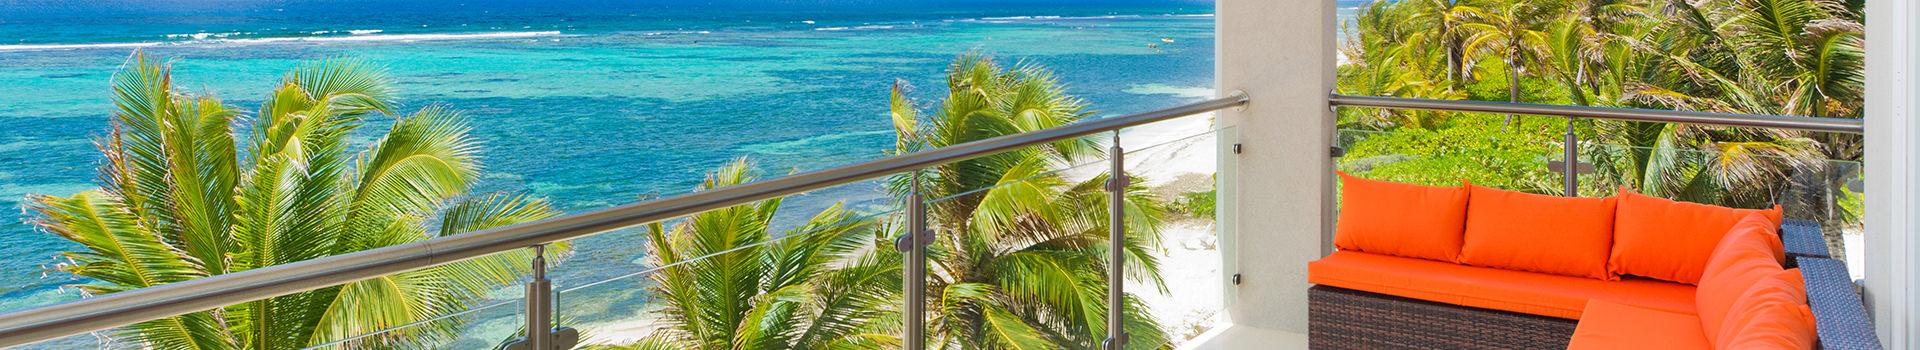 Sea Palm Villas - Cayman Islands